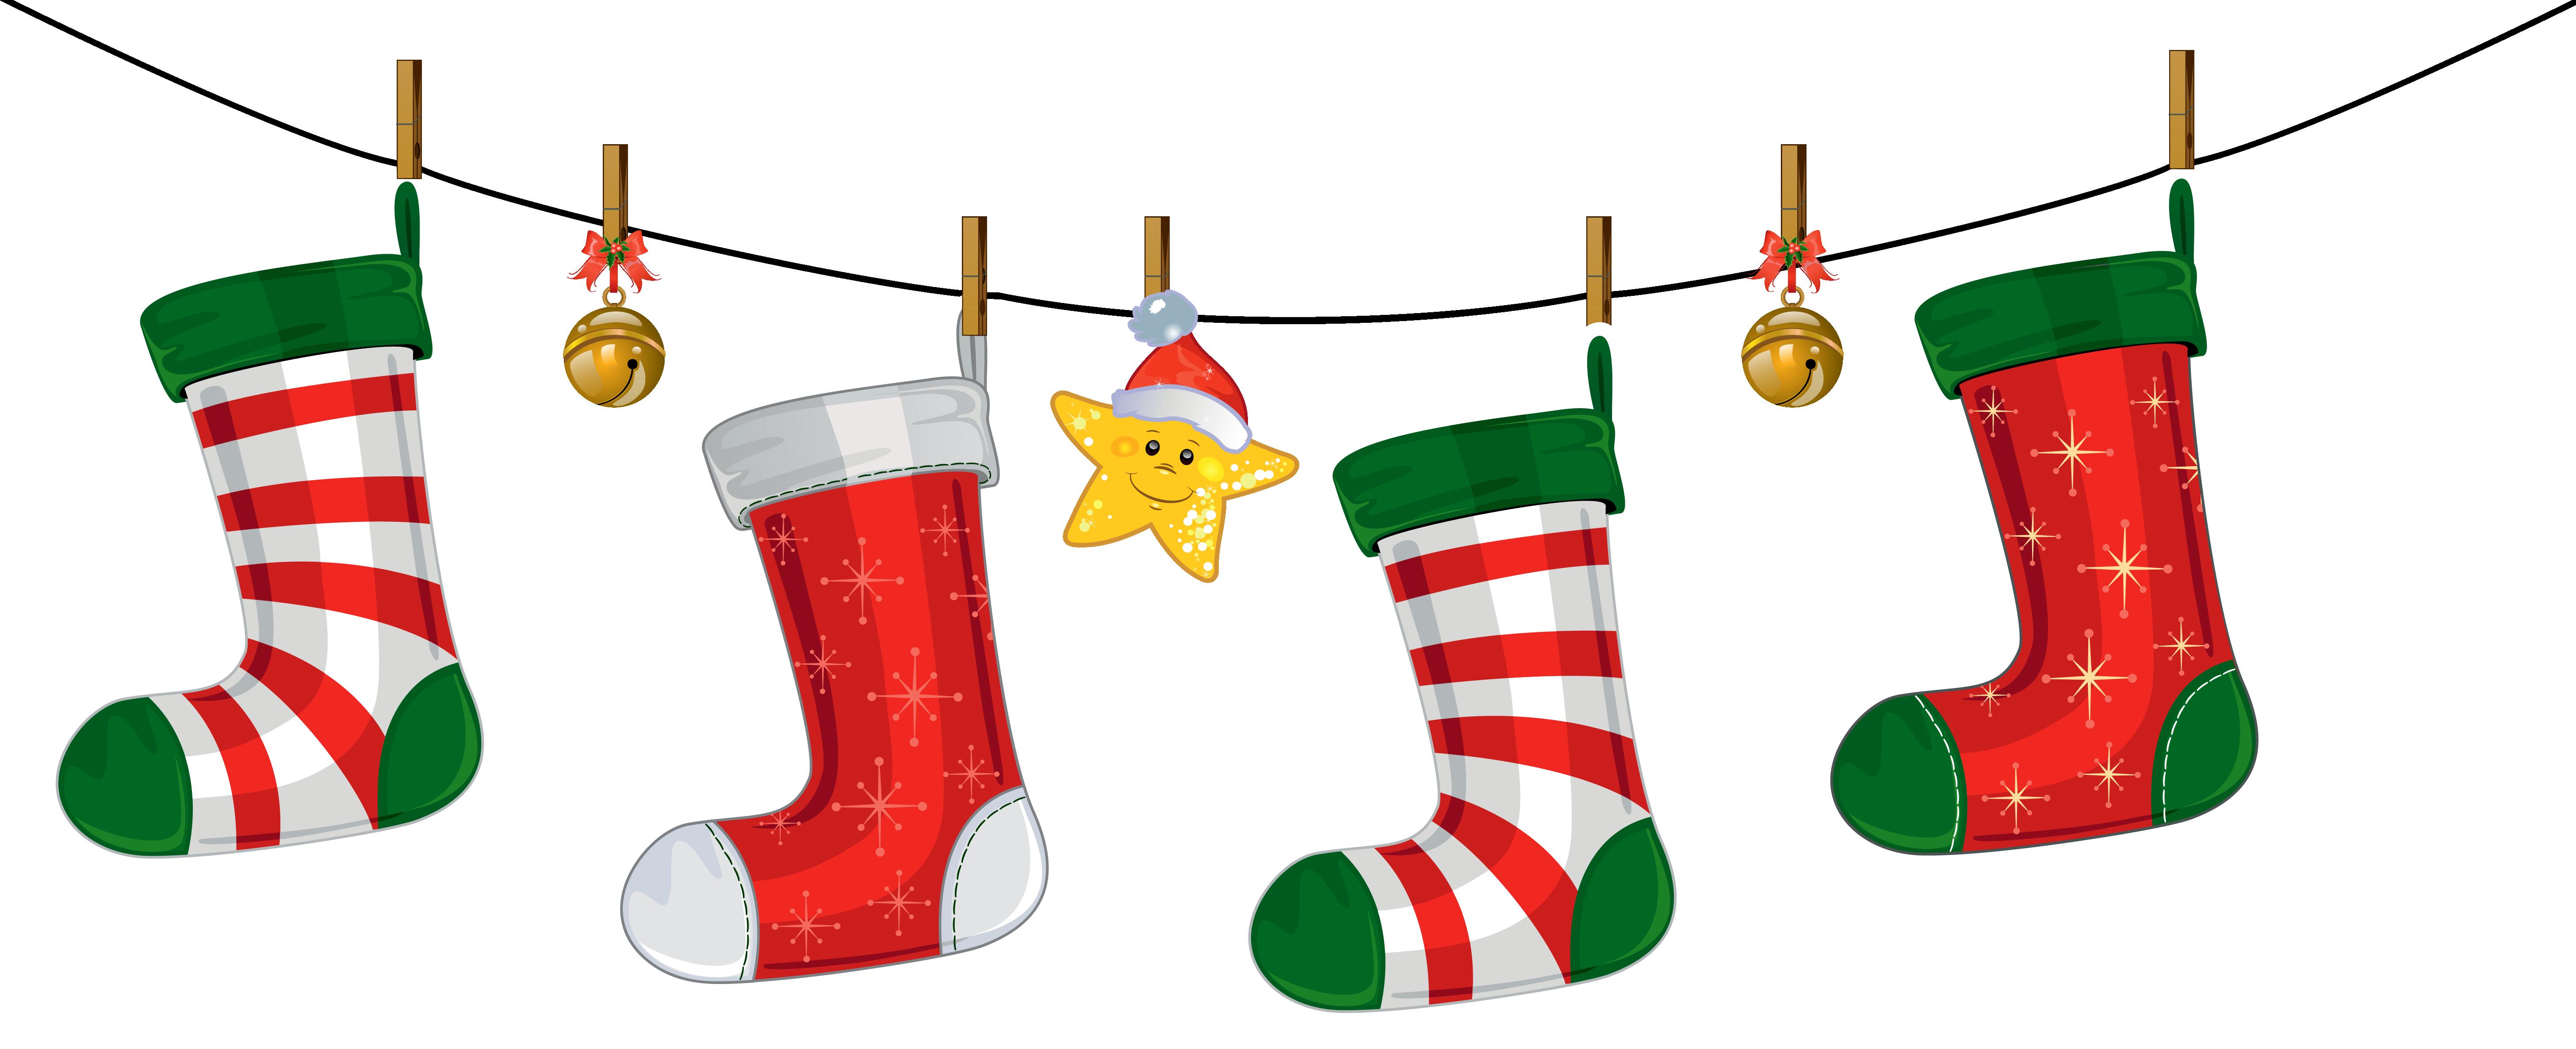 Transparent Christmas Stockings Decorati-Transparent Christmas Stockings Decoration Png Clipart Japoland-18